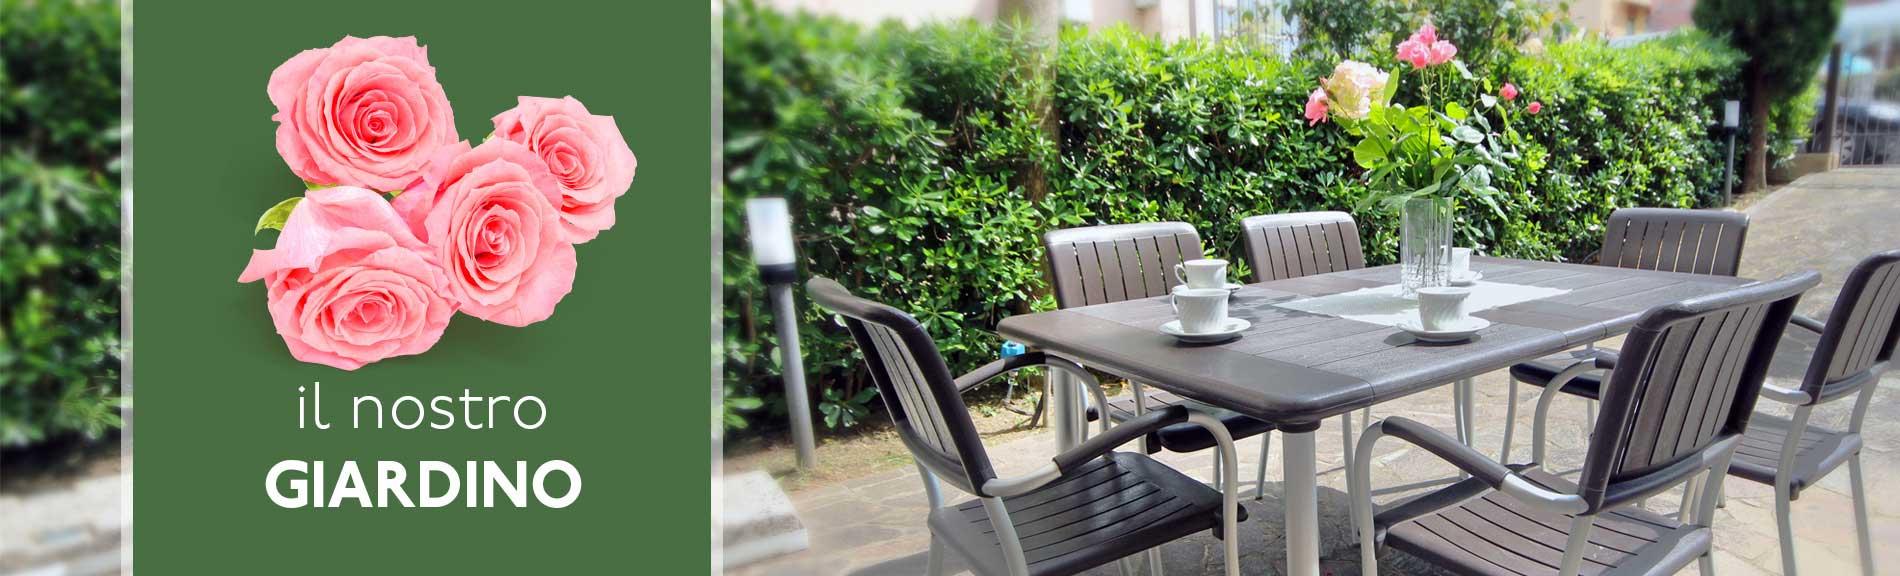 Appartamento Misano con giardino